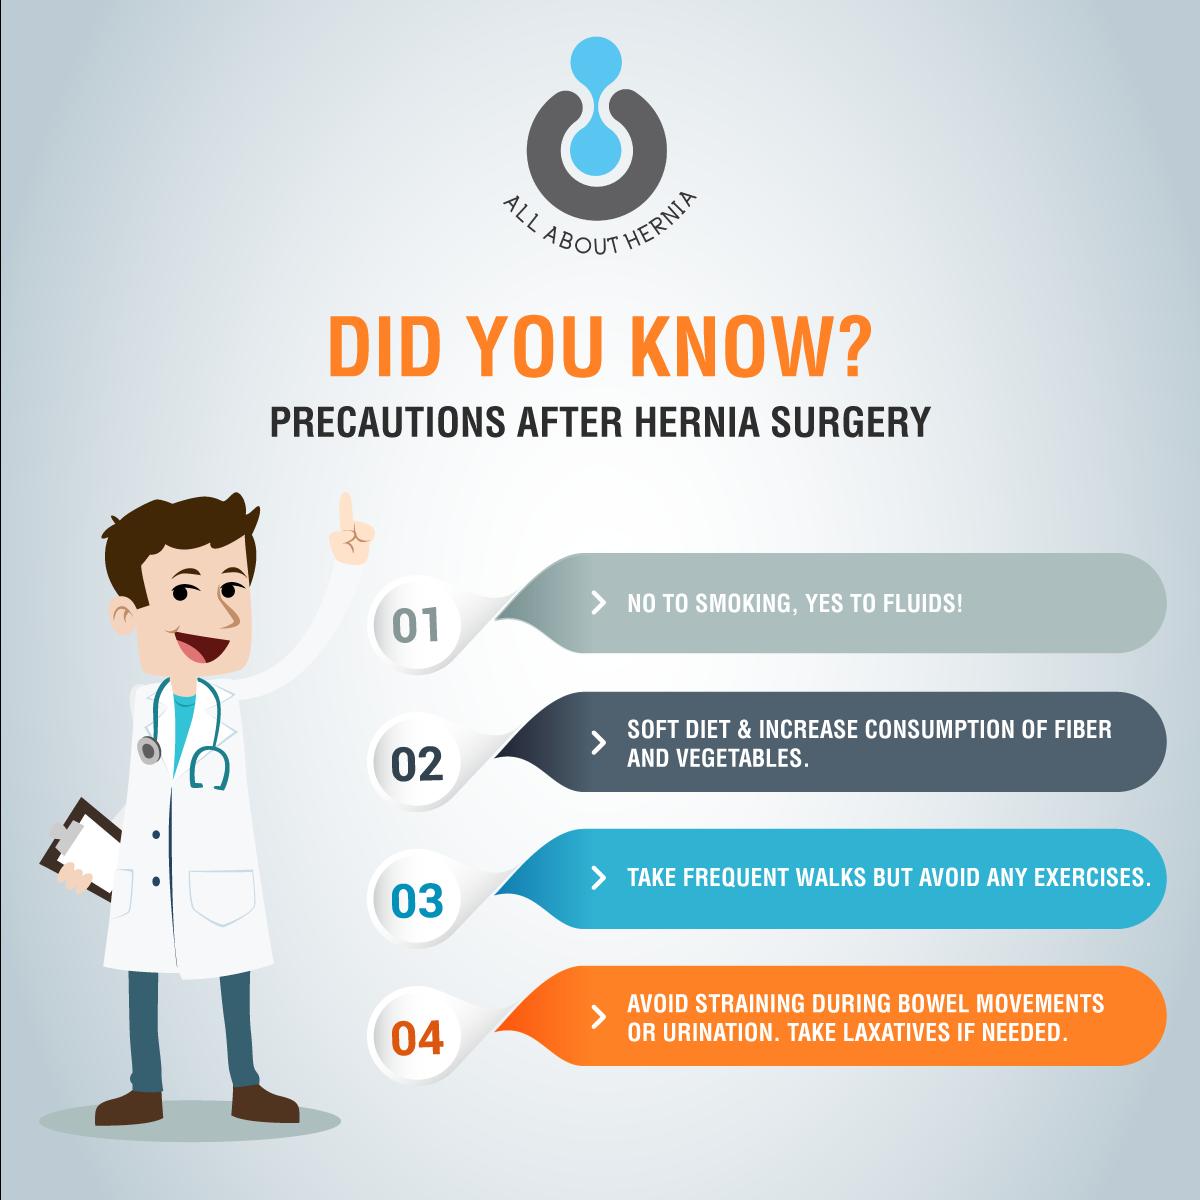 Precautions After Hernia Surgery